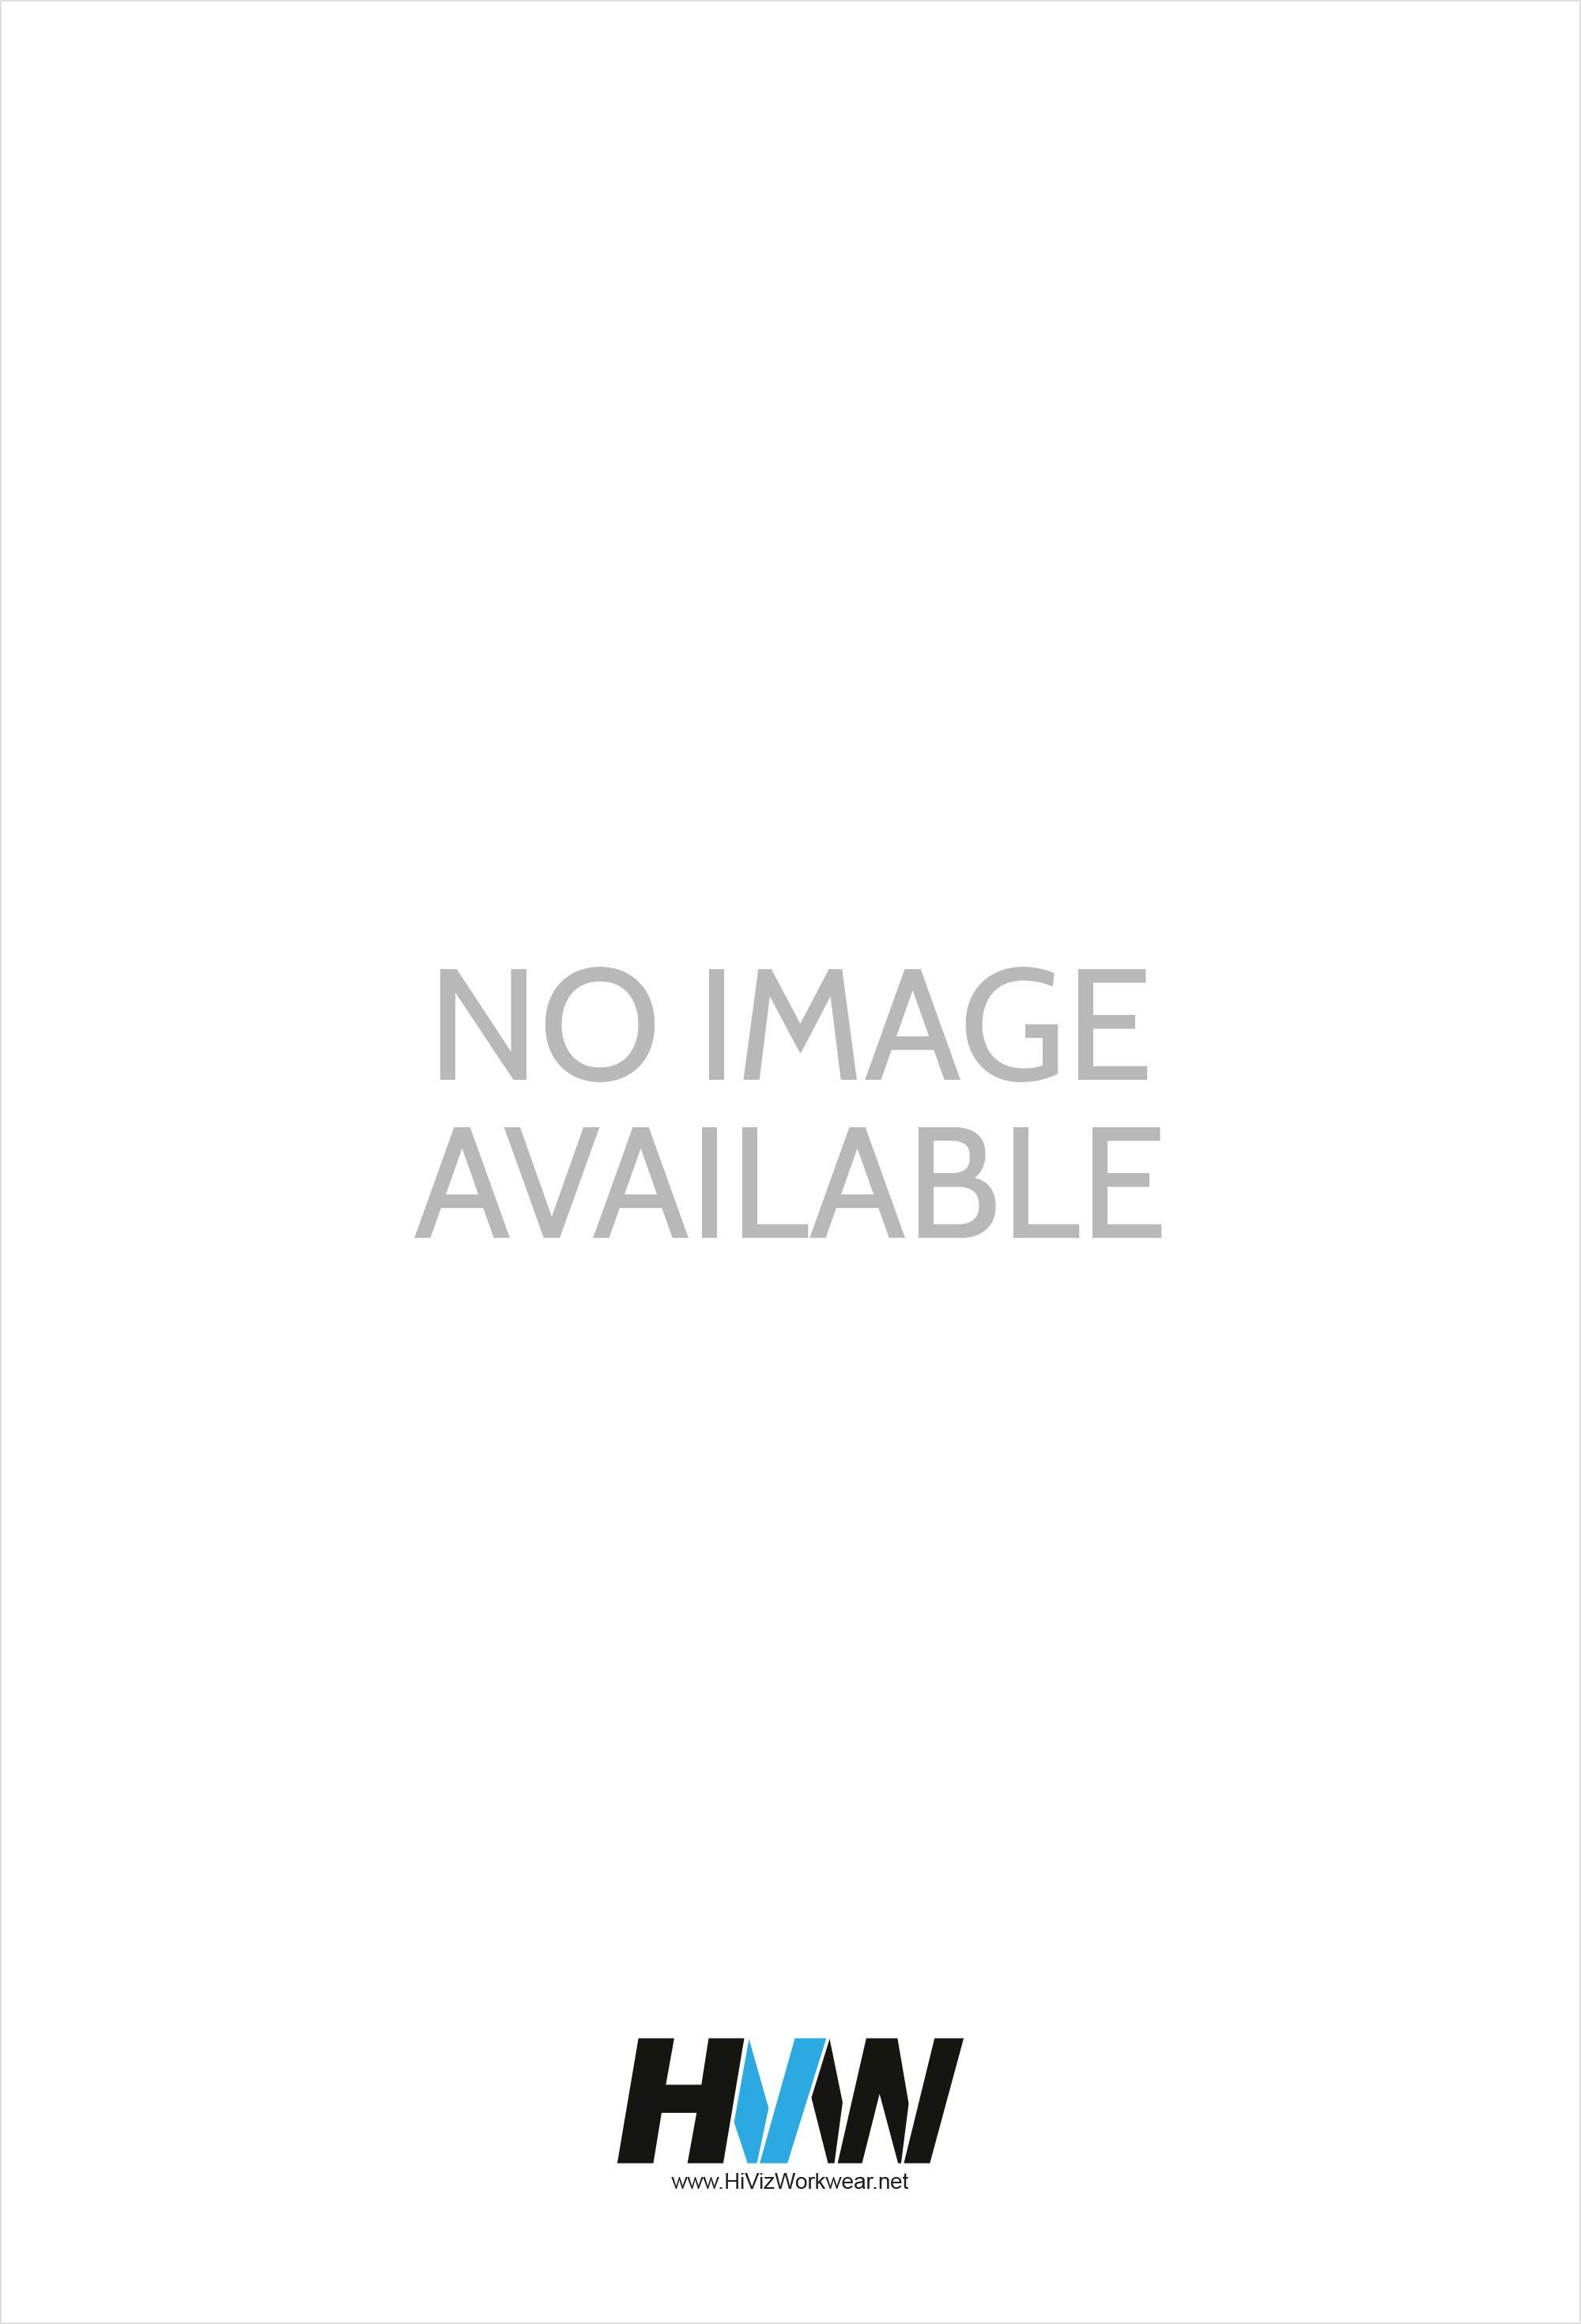 KK102 Short Sleeved Business Shirt (Collar Size 14.5 To 19.0) 4 COLOURS